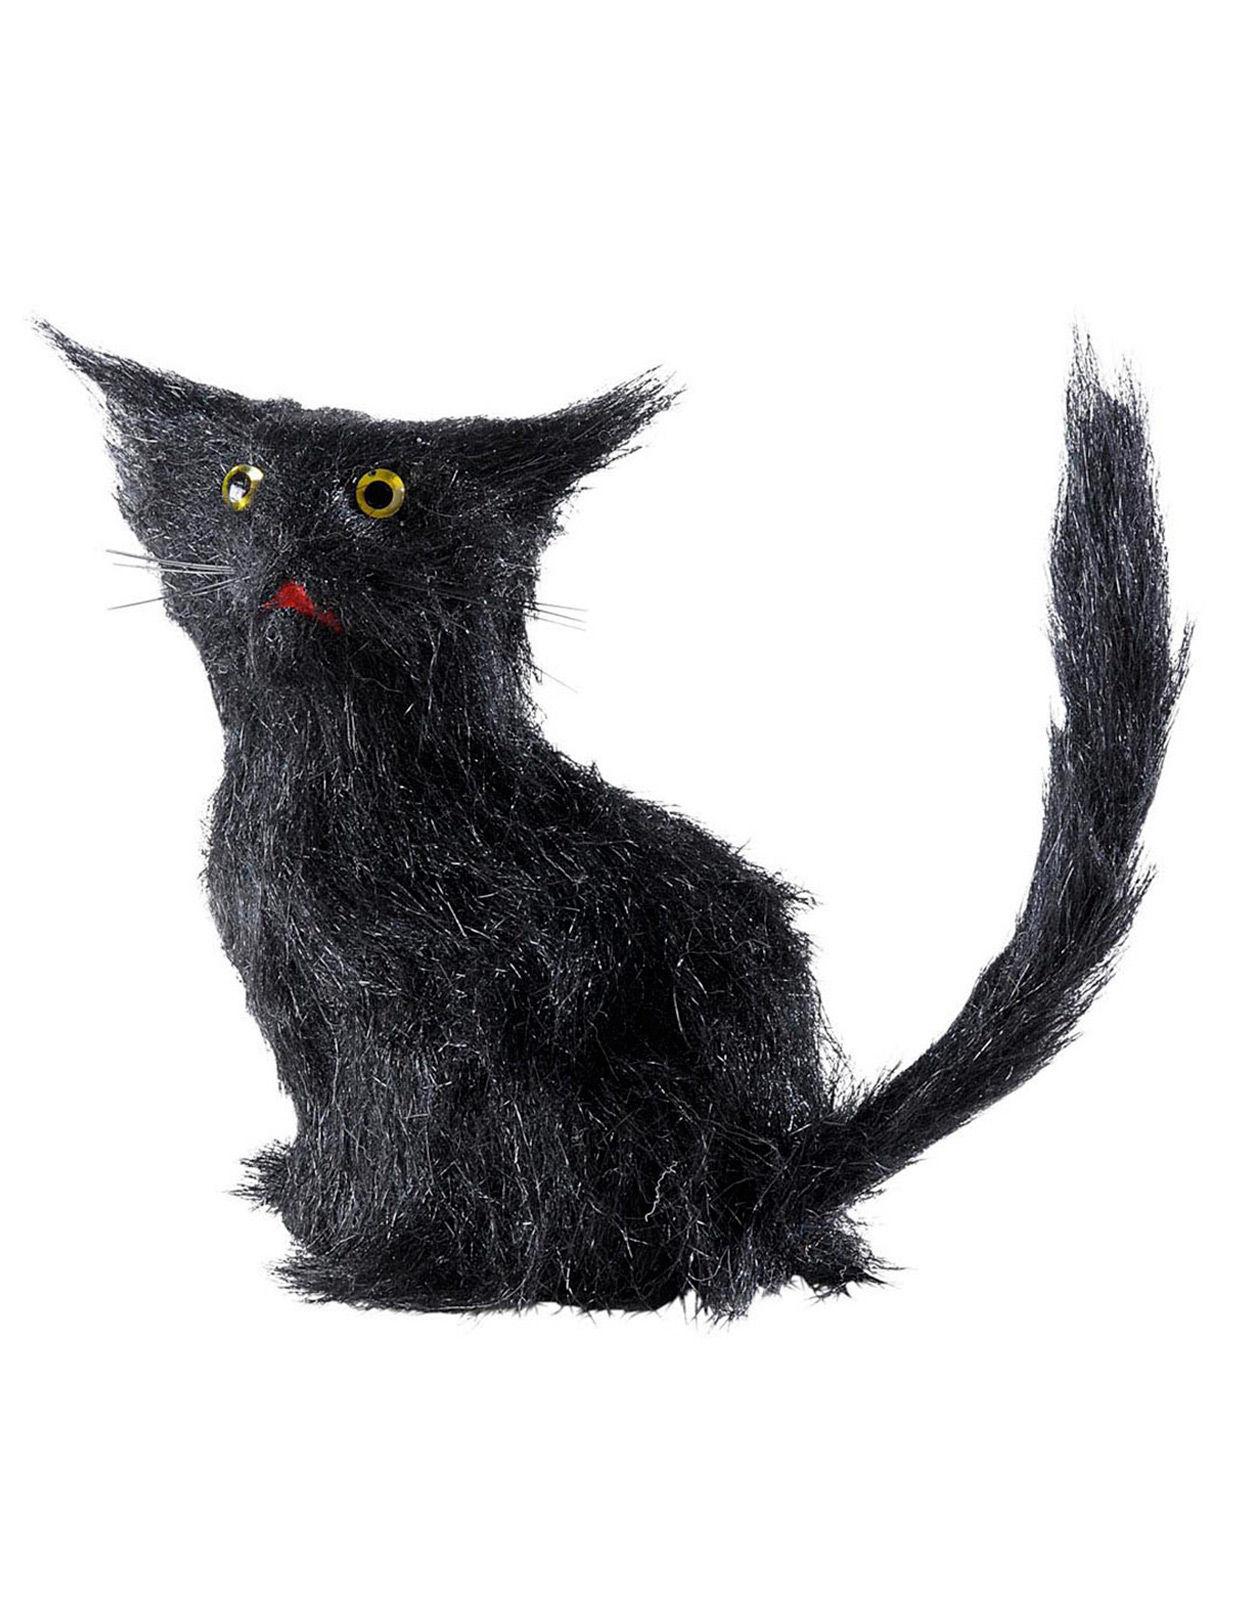 katze mit fell halloween deko figur schwarz 12cm g nstige faschings partydeko zubeh r bei. Black Bedroom Furniture Sets. Home Design Ideas